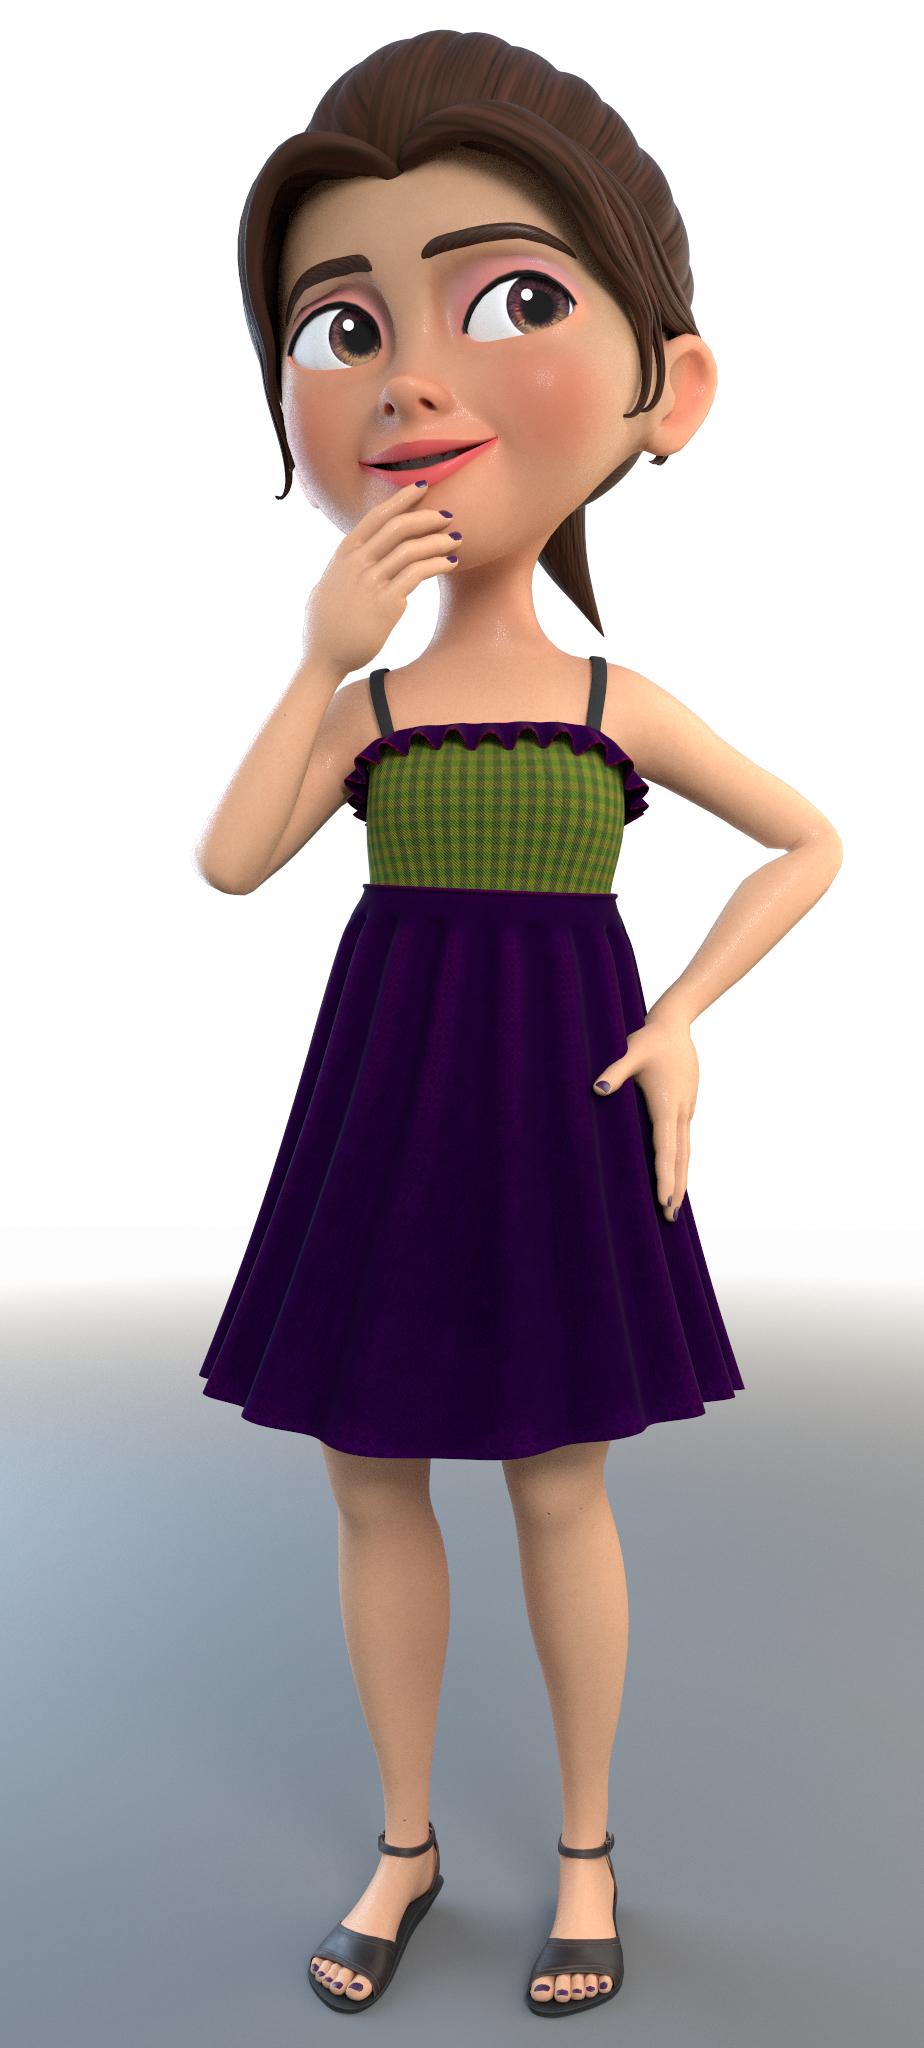 olivia cartoon girl rig character 3D model